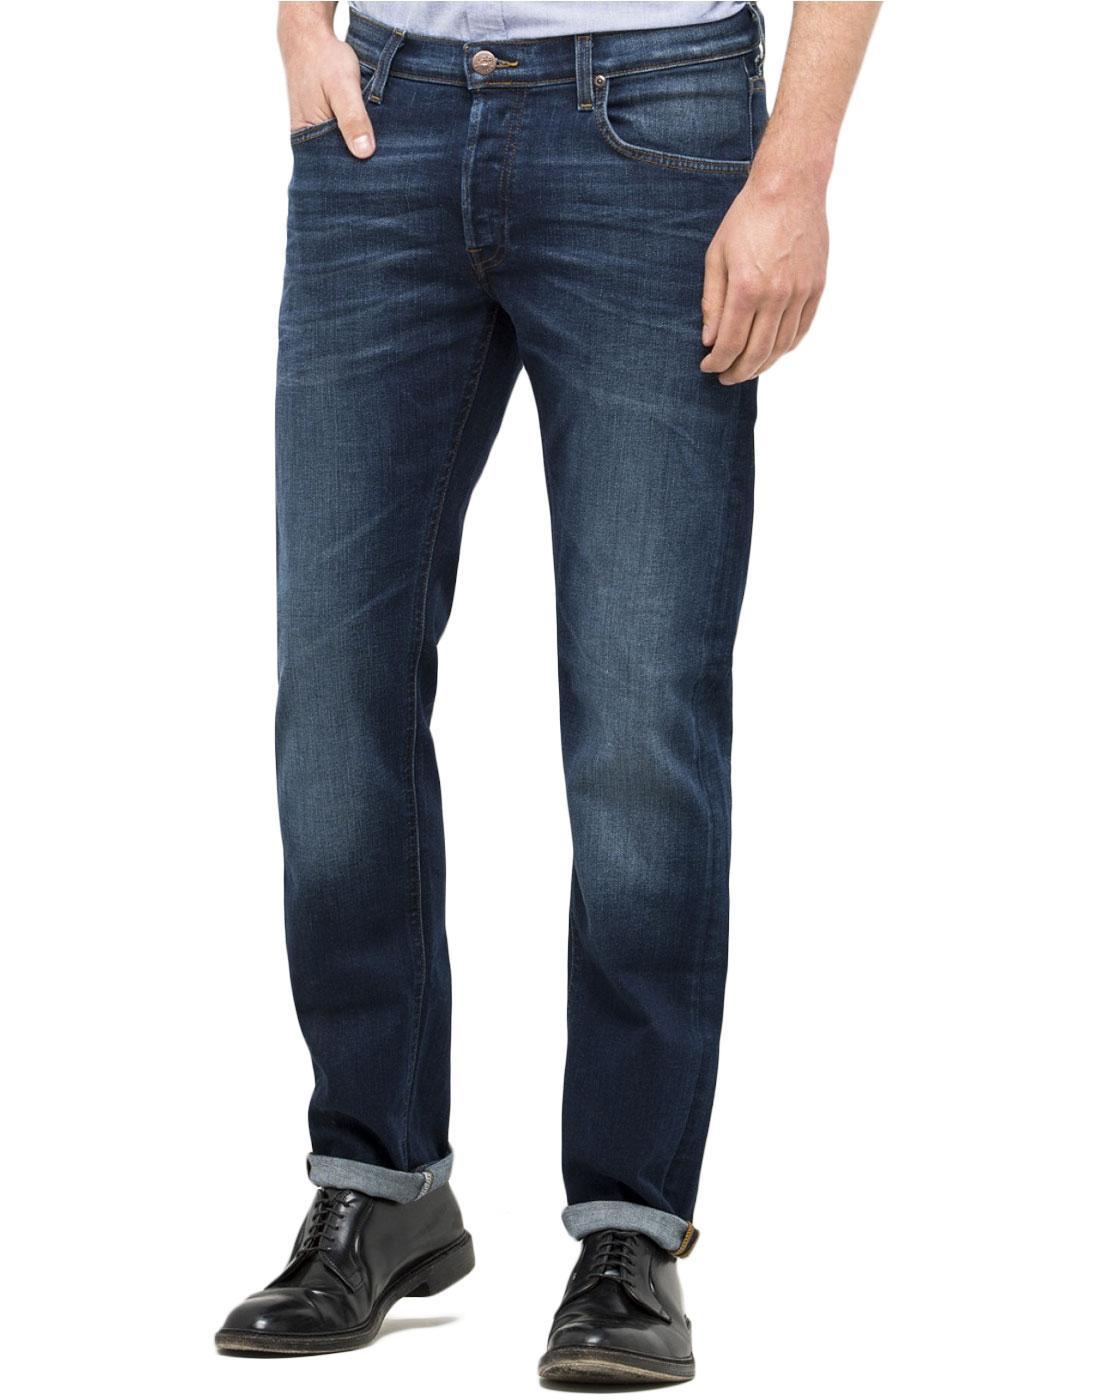 Daren LEE Mod Regular Slim Indigo Denim Jeans (BB)